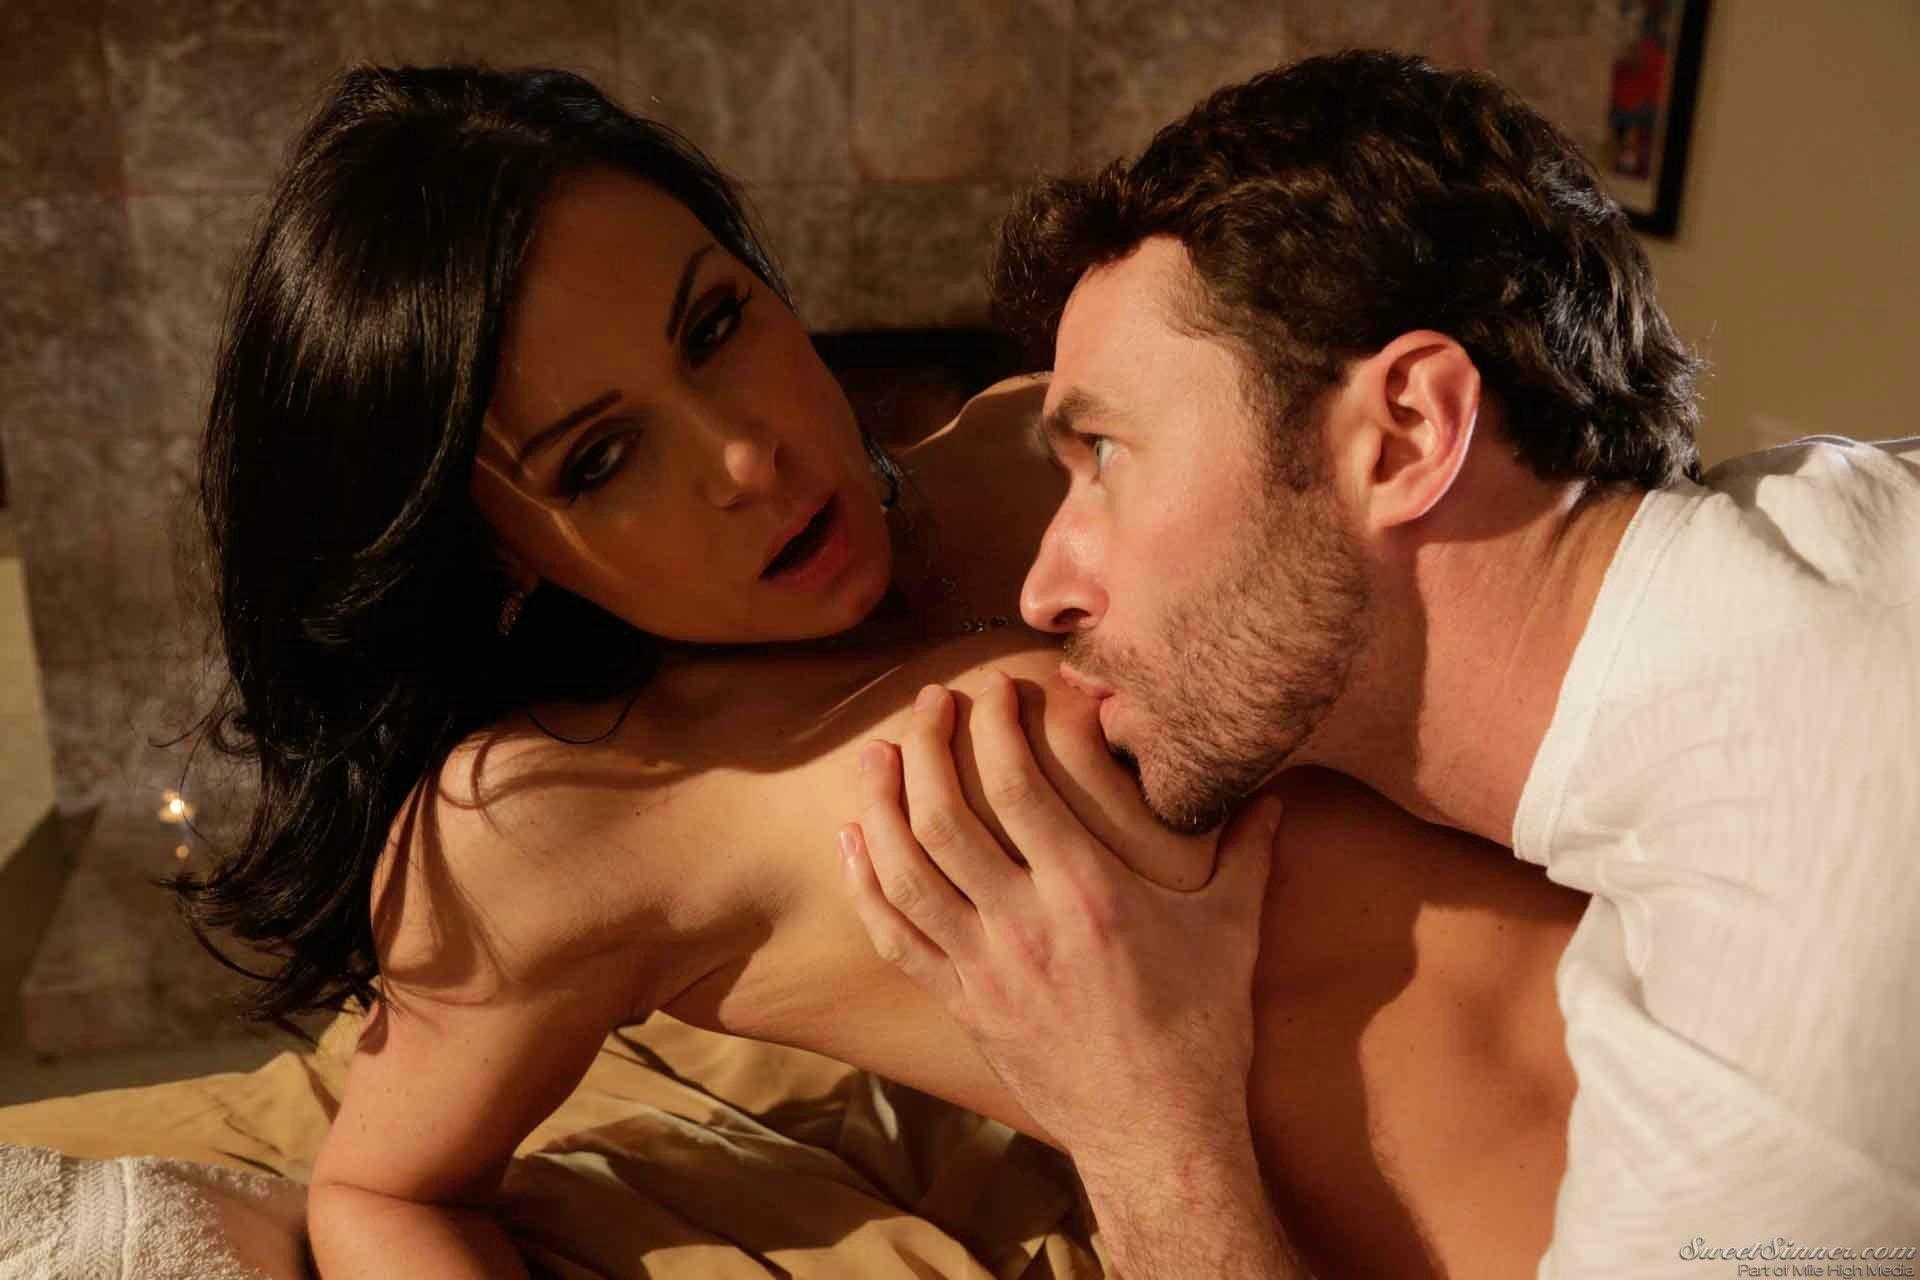 erotic massage flensburg escort kontakt